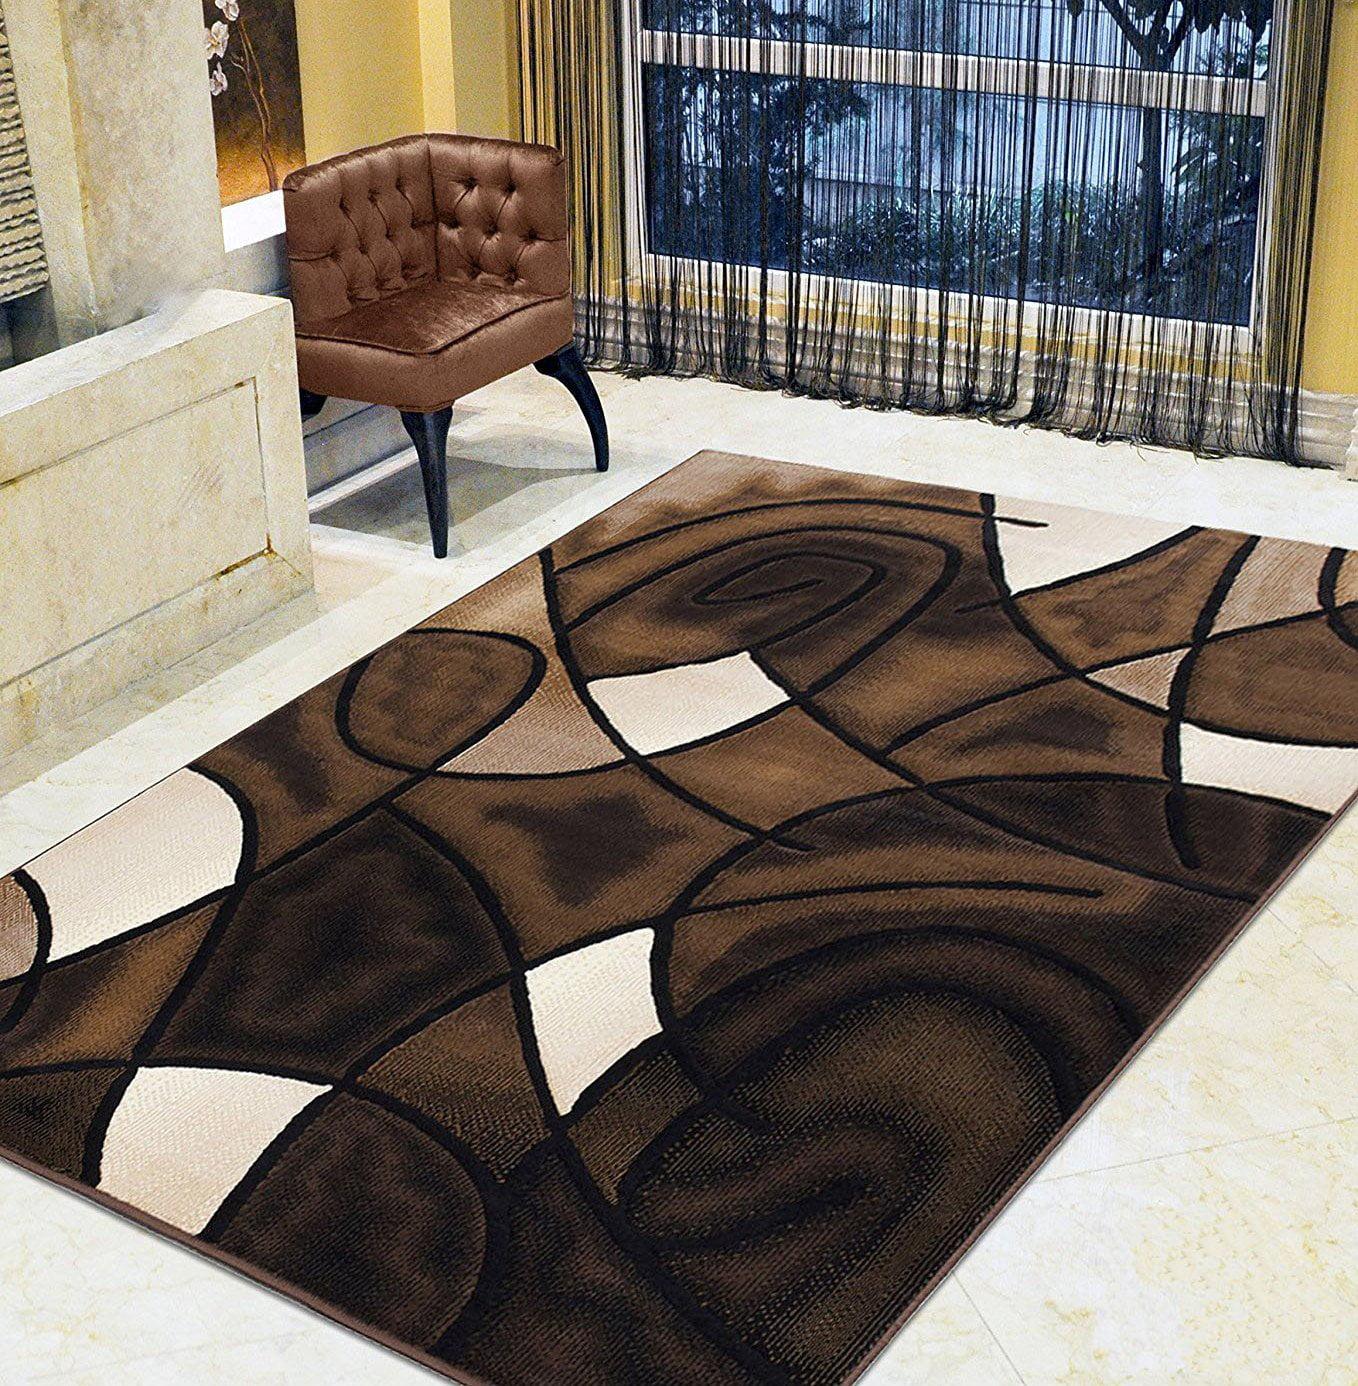 Chocolate Brown Beige Mocha Black Abstract Area Rug Modern Contemporary Circles And Wavey Swirlls Design Pattern Walmart Com Walmart Com